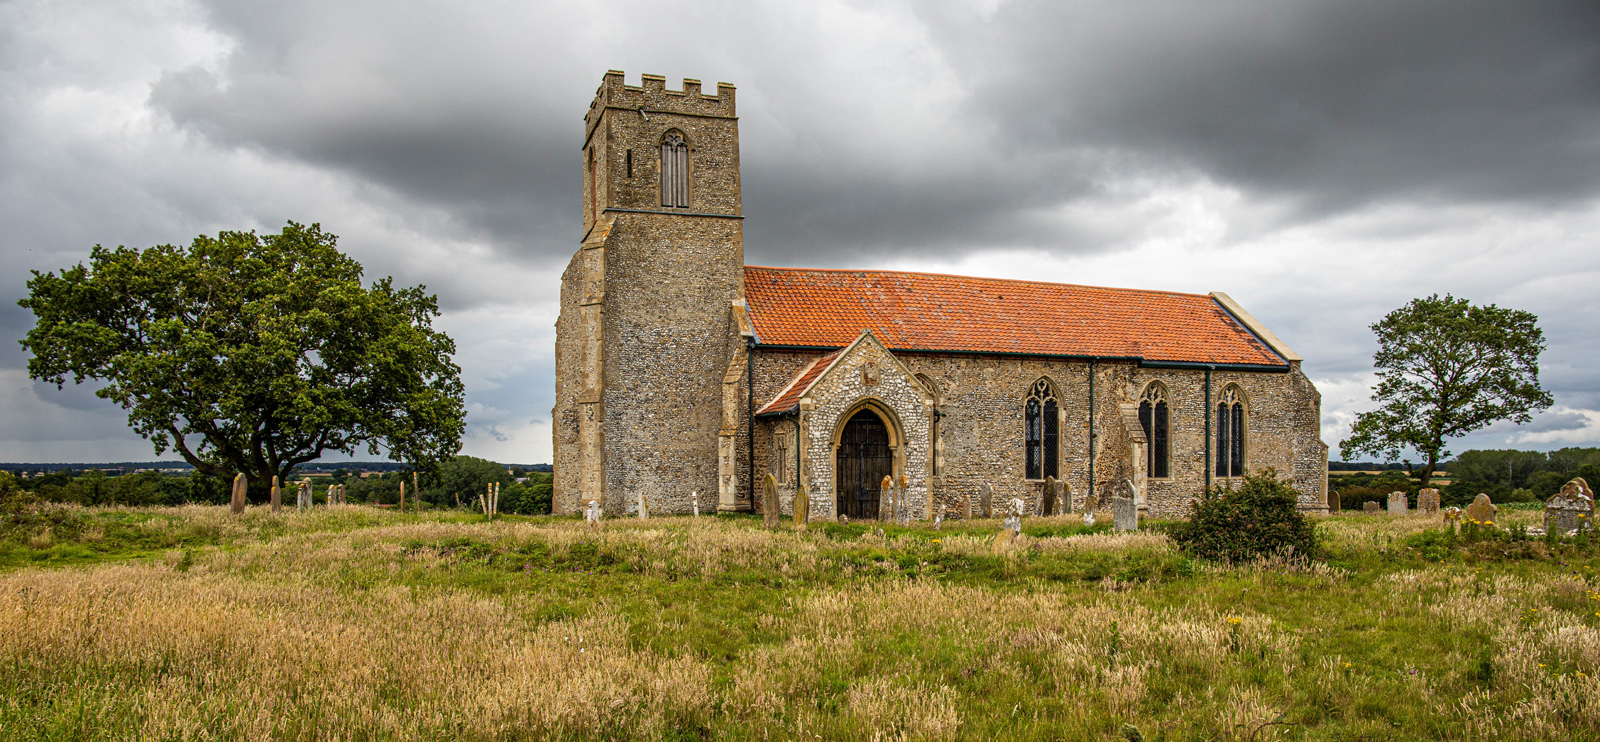 3. corpusty church.ian ashton